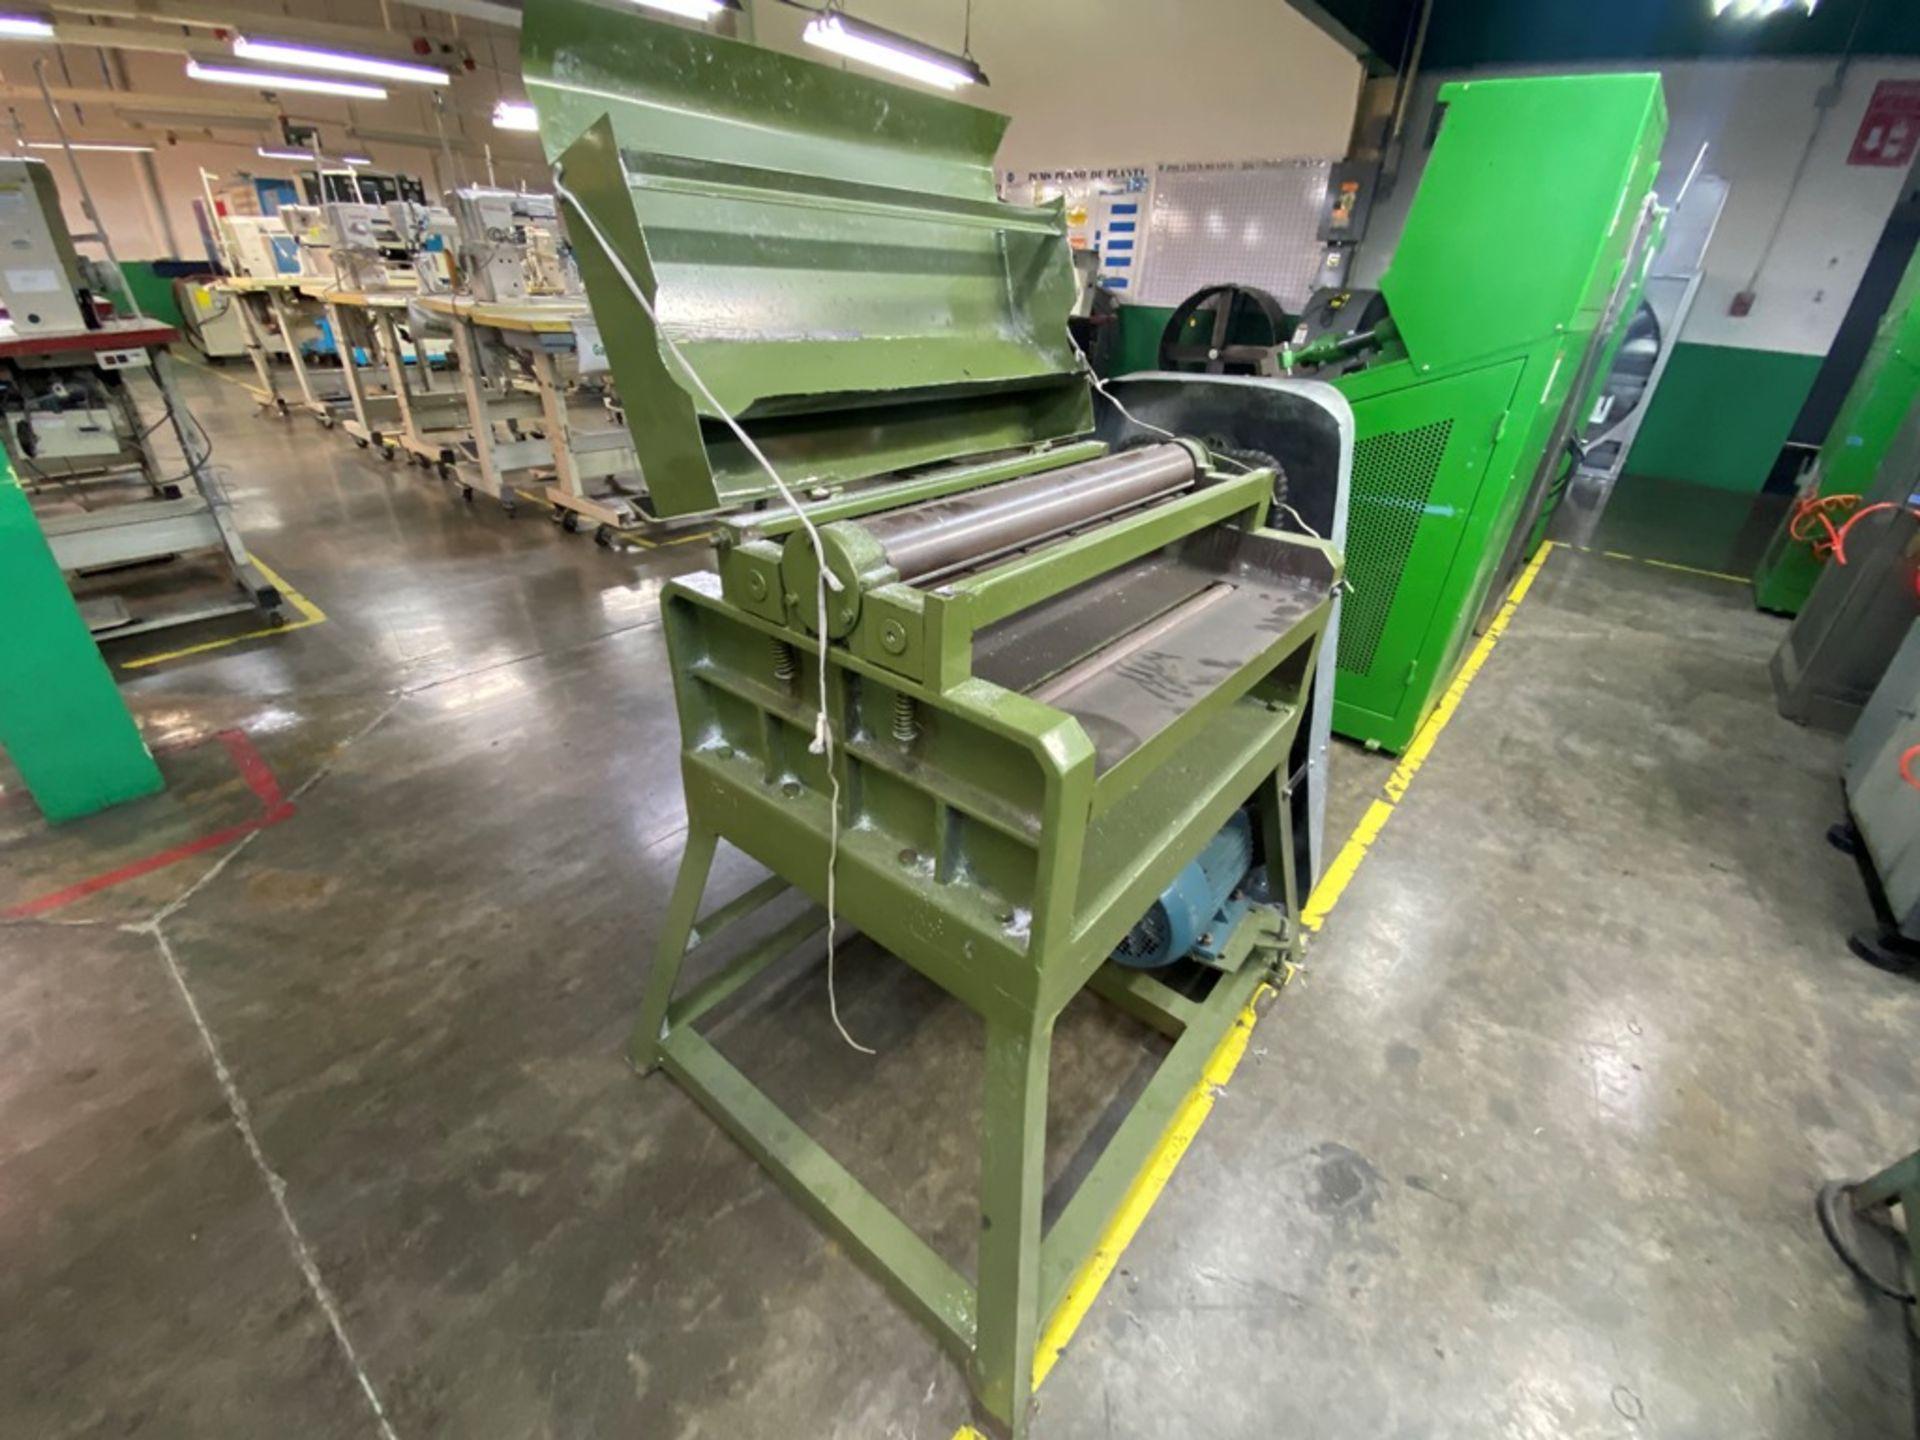 Lot 44 - Lijadora de tabla marca Funing Woodworking Machinery, Activo: PCM02143